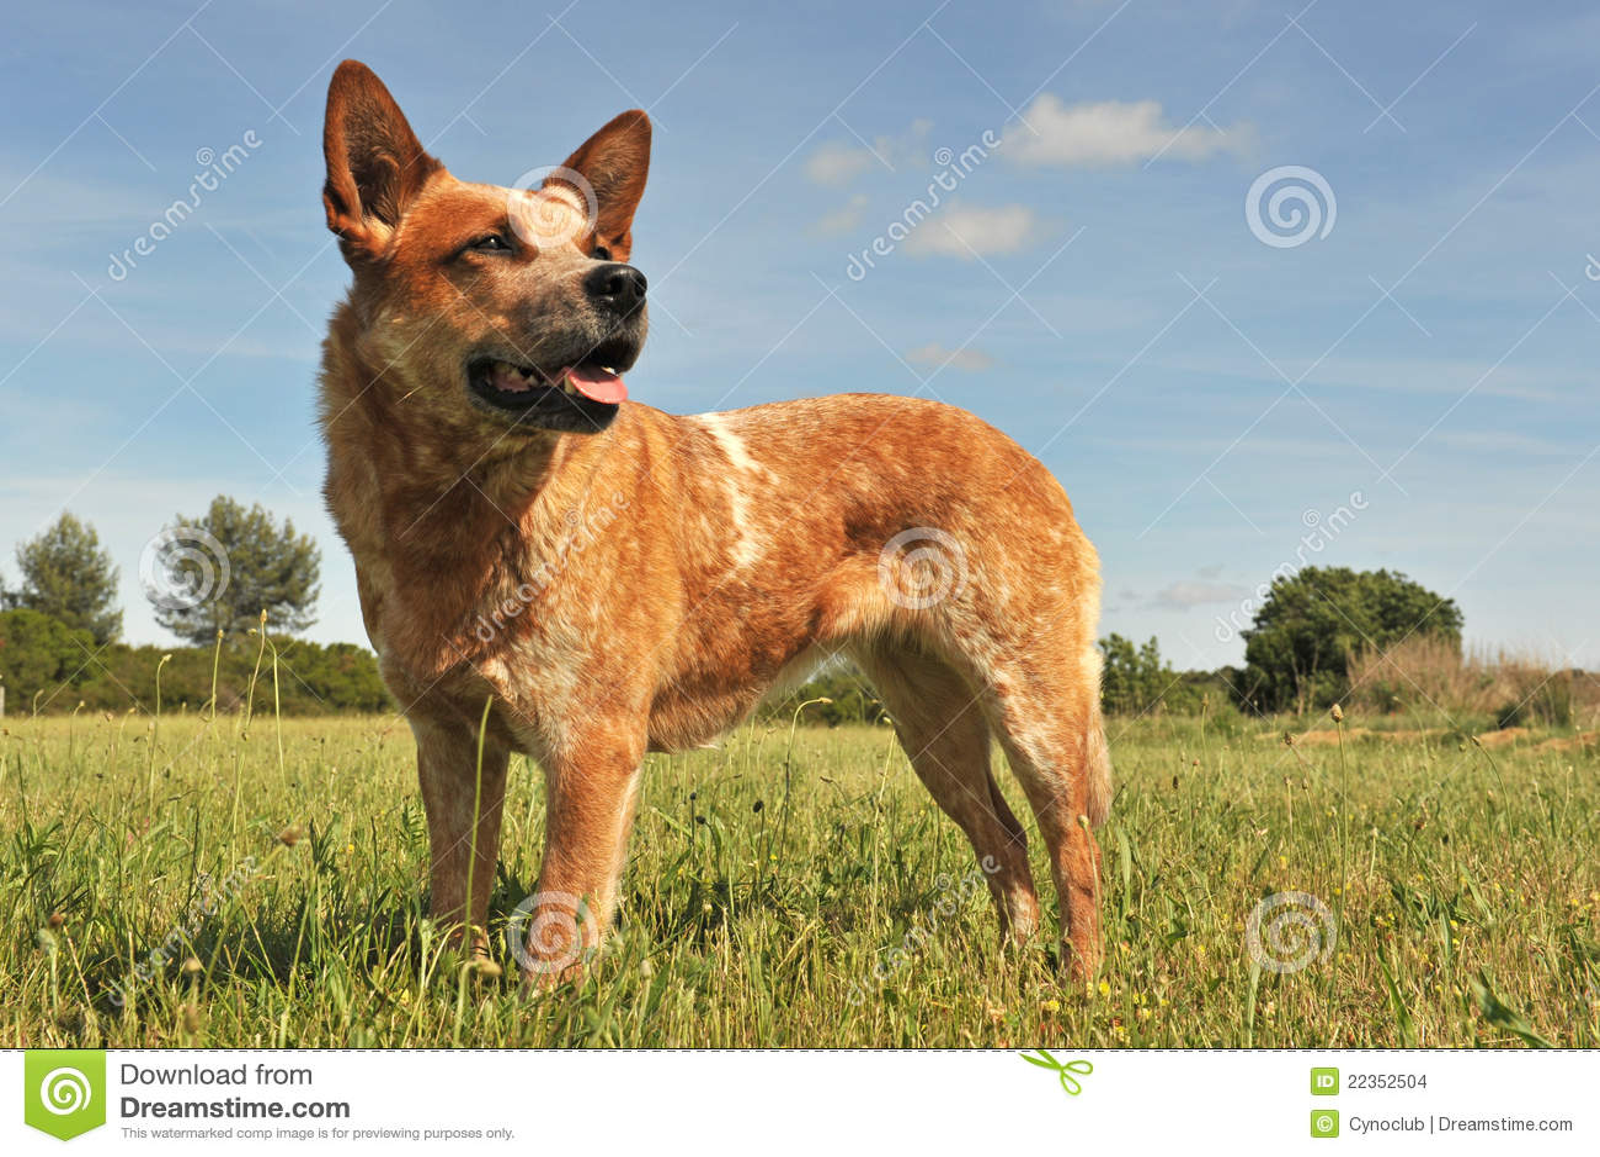 Australian Cattle Dog Stock Images - Image: 22352504